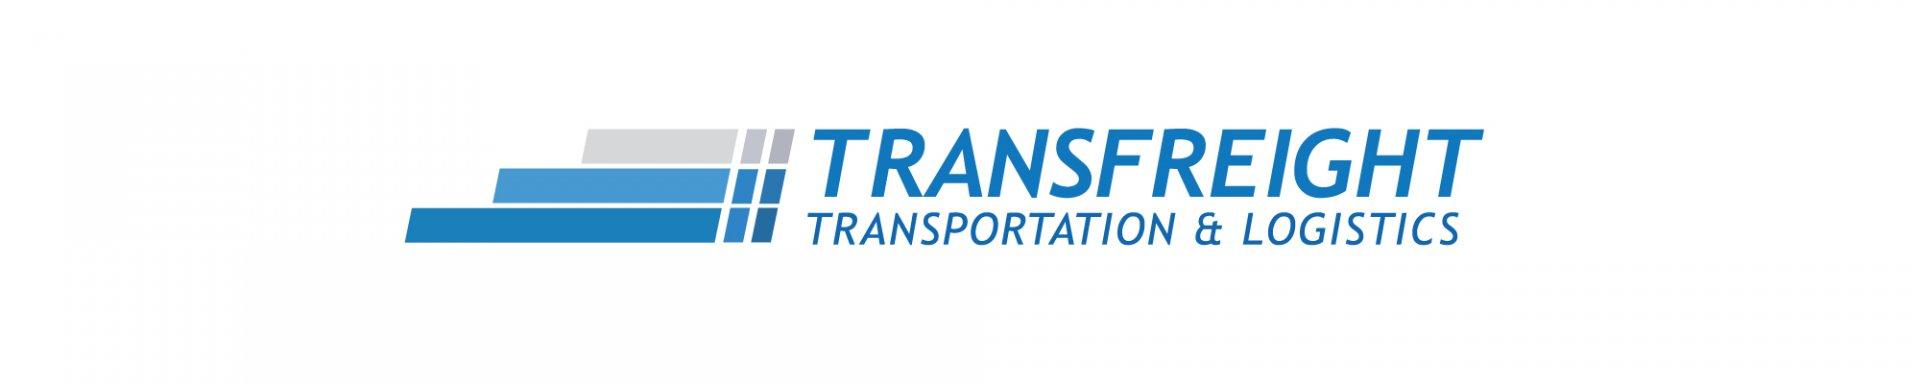 Трансфрейт ООД logo